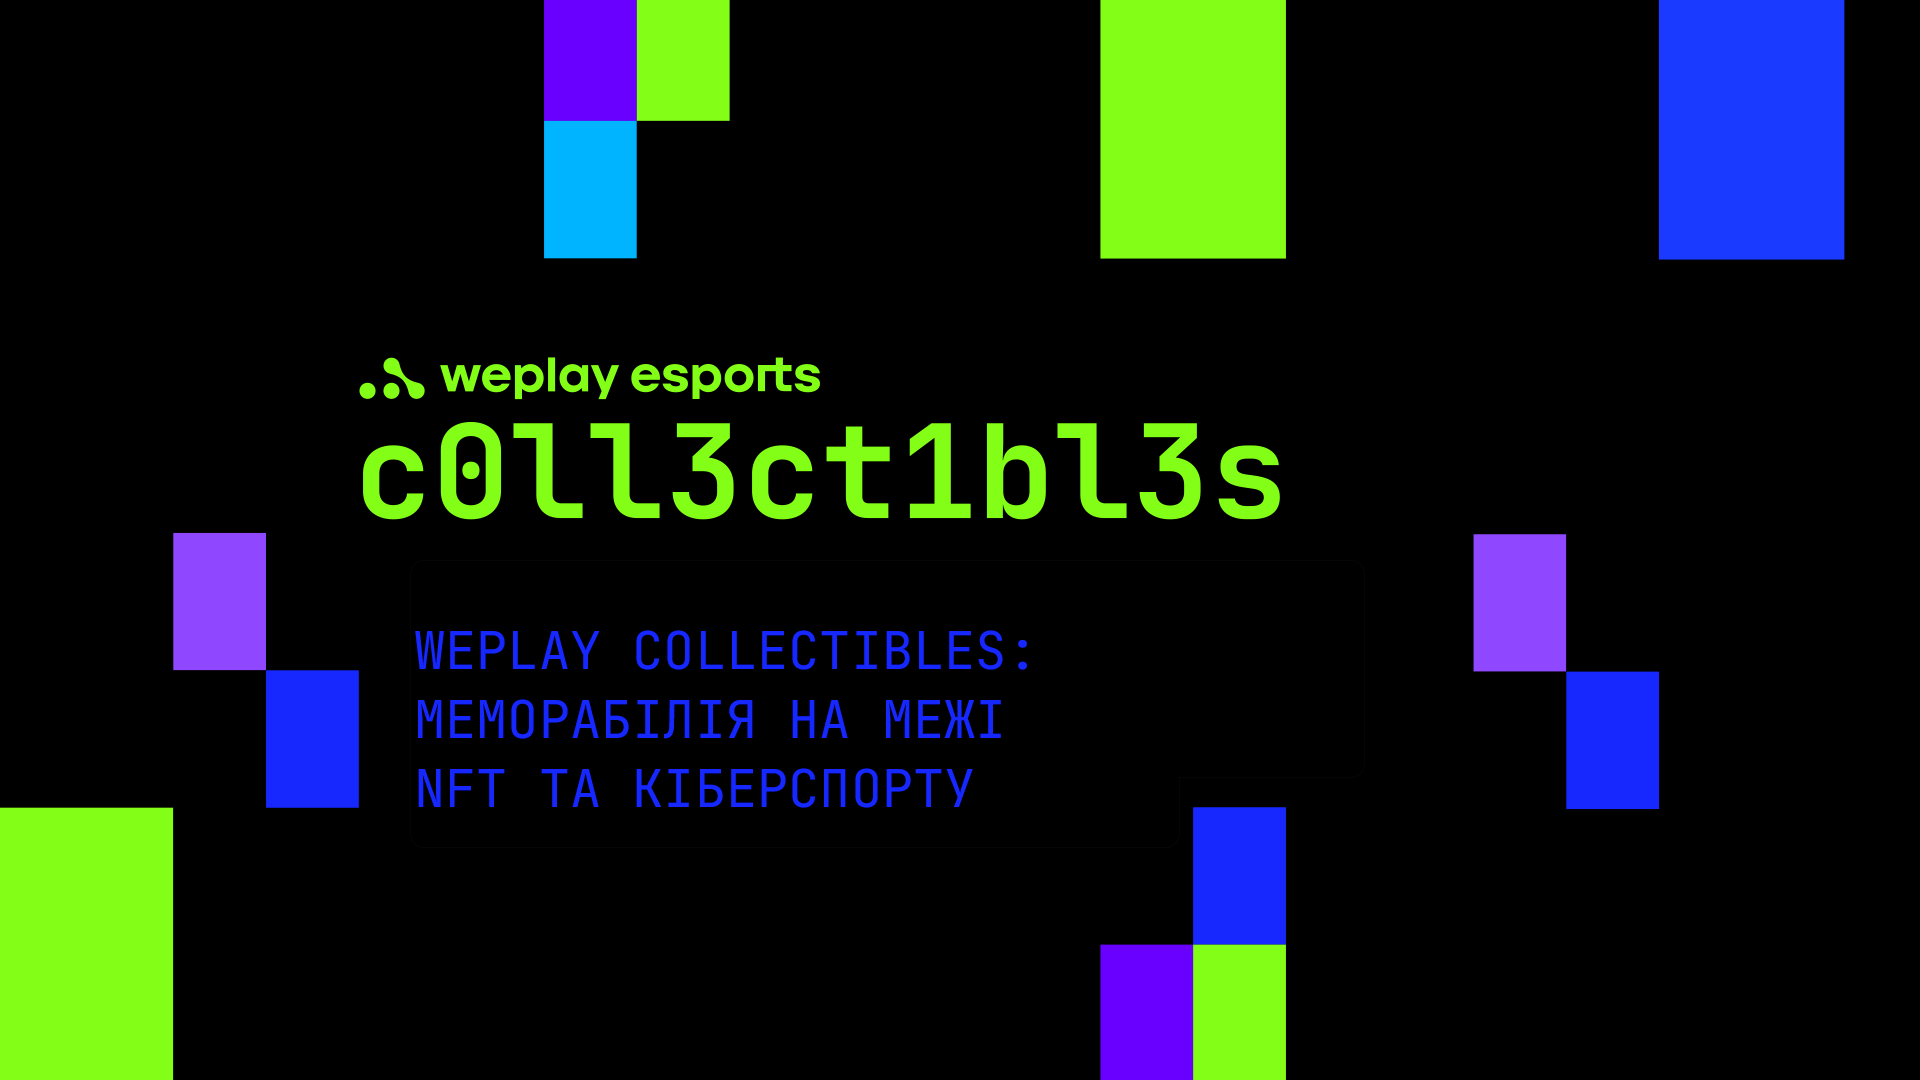 WePlay Collectibles: меморабілія на межі NFT та кіберспорту